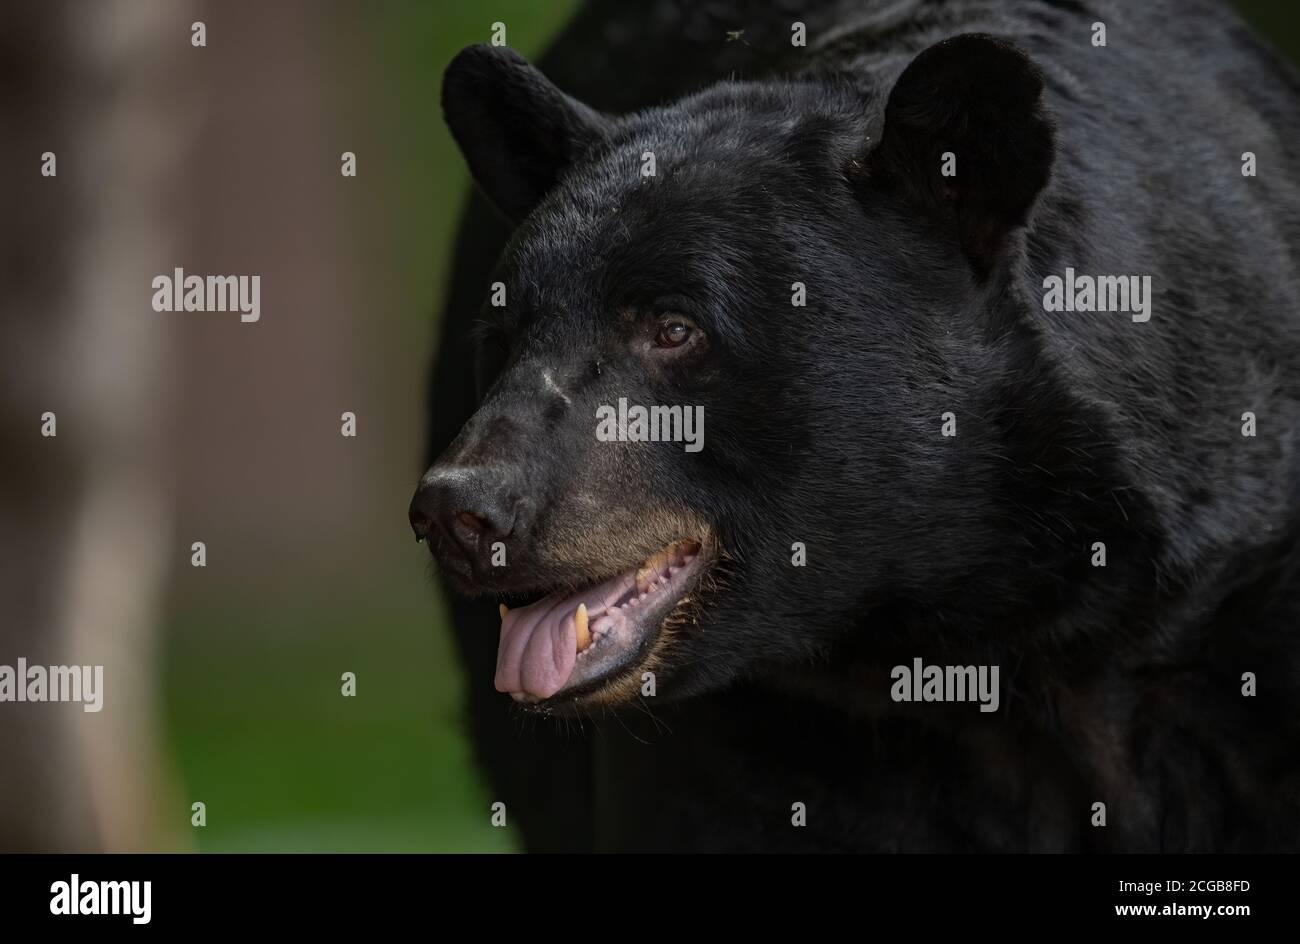 Black Bear Portrai Stock Photo